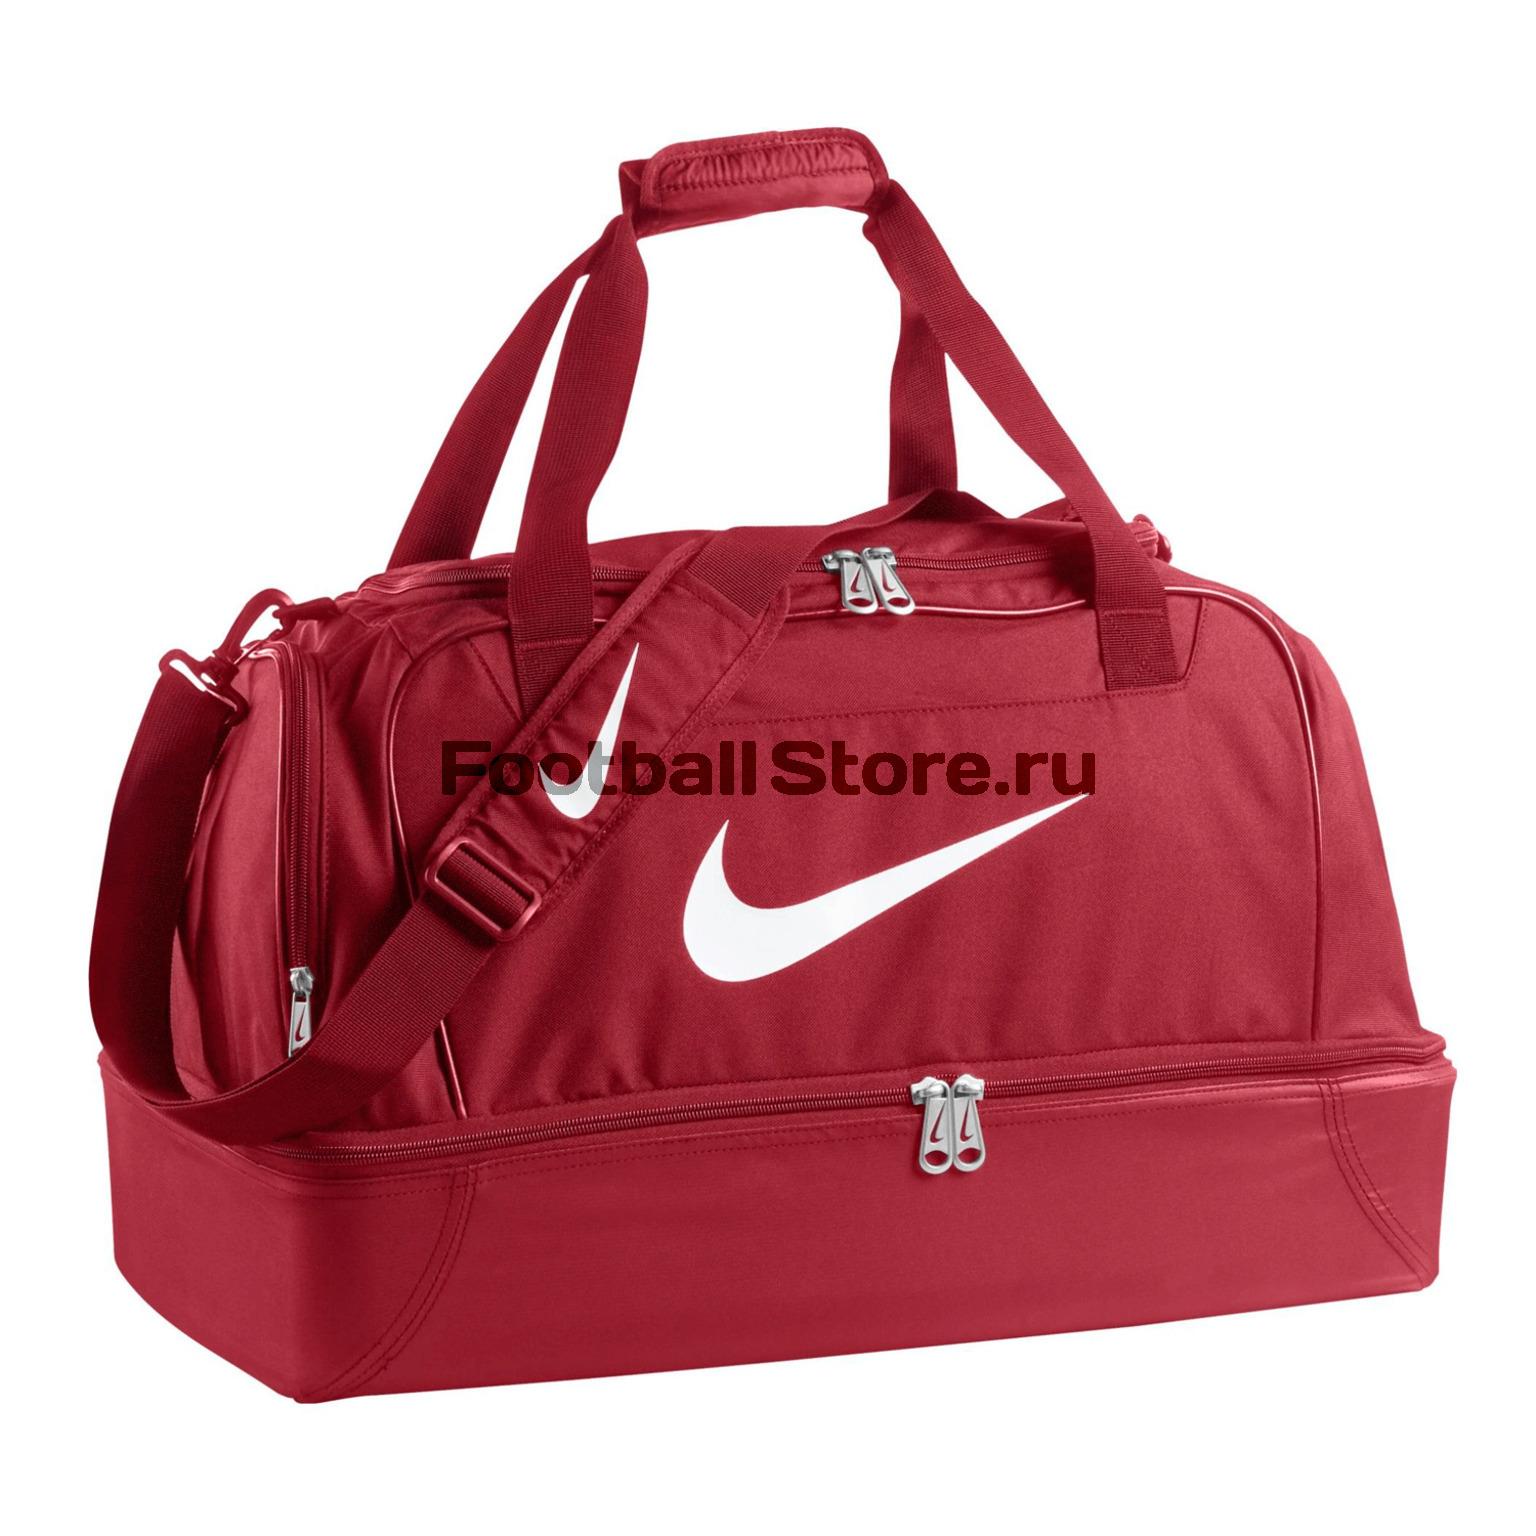 Сумки/Рюкзаки Nike Сумка Nike club team extra large hard